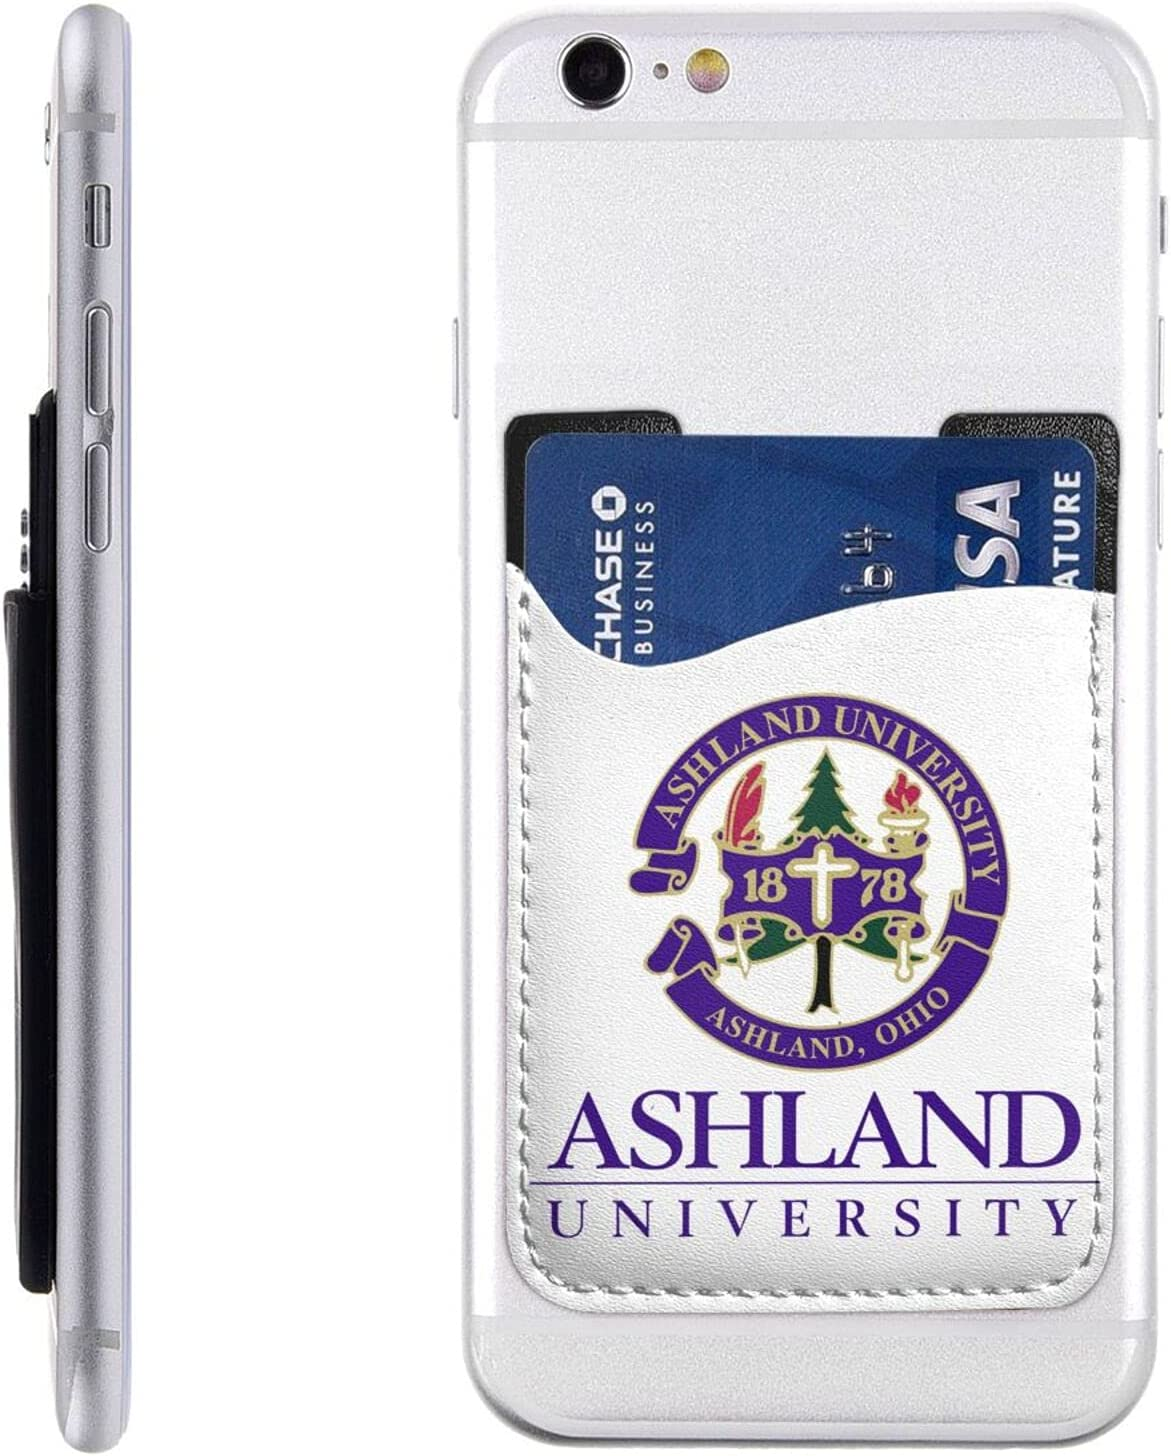 Ashland University Logo 3 Cell Detroit Mall Phone C Card List price Id Holder Stick-On